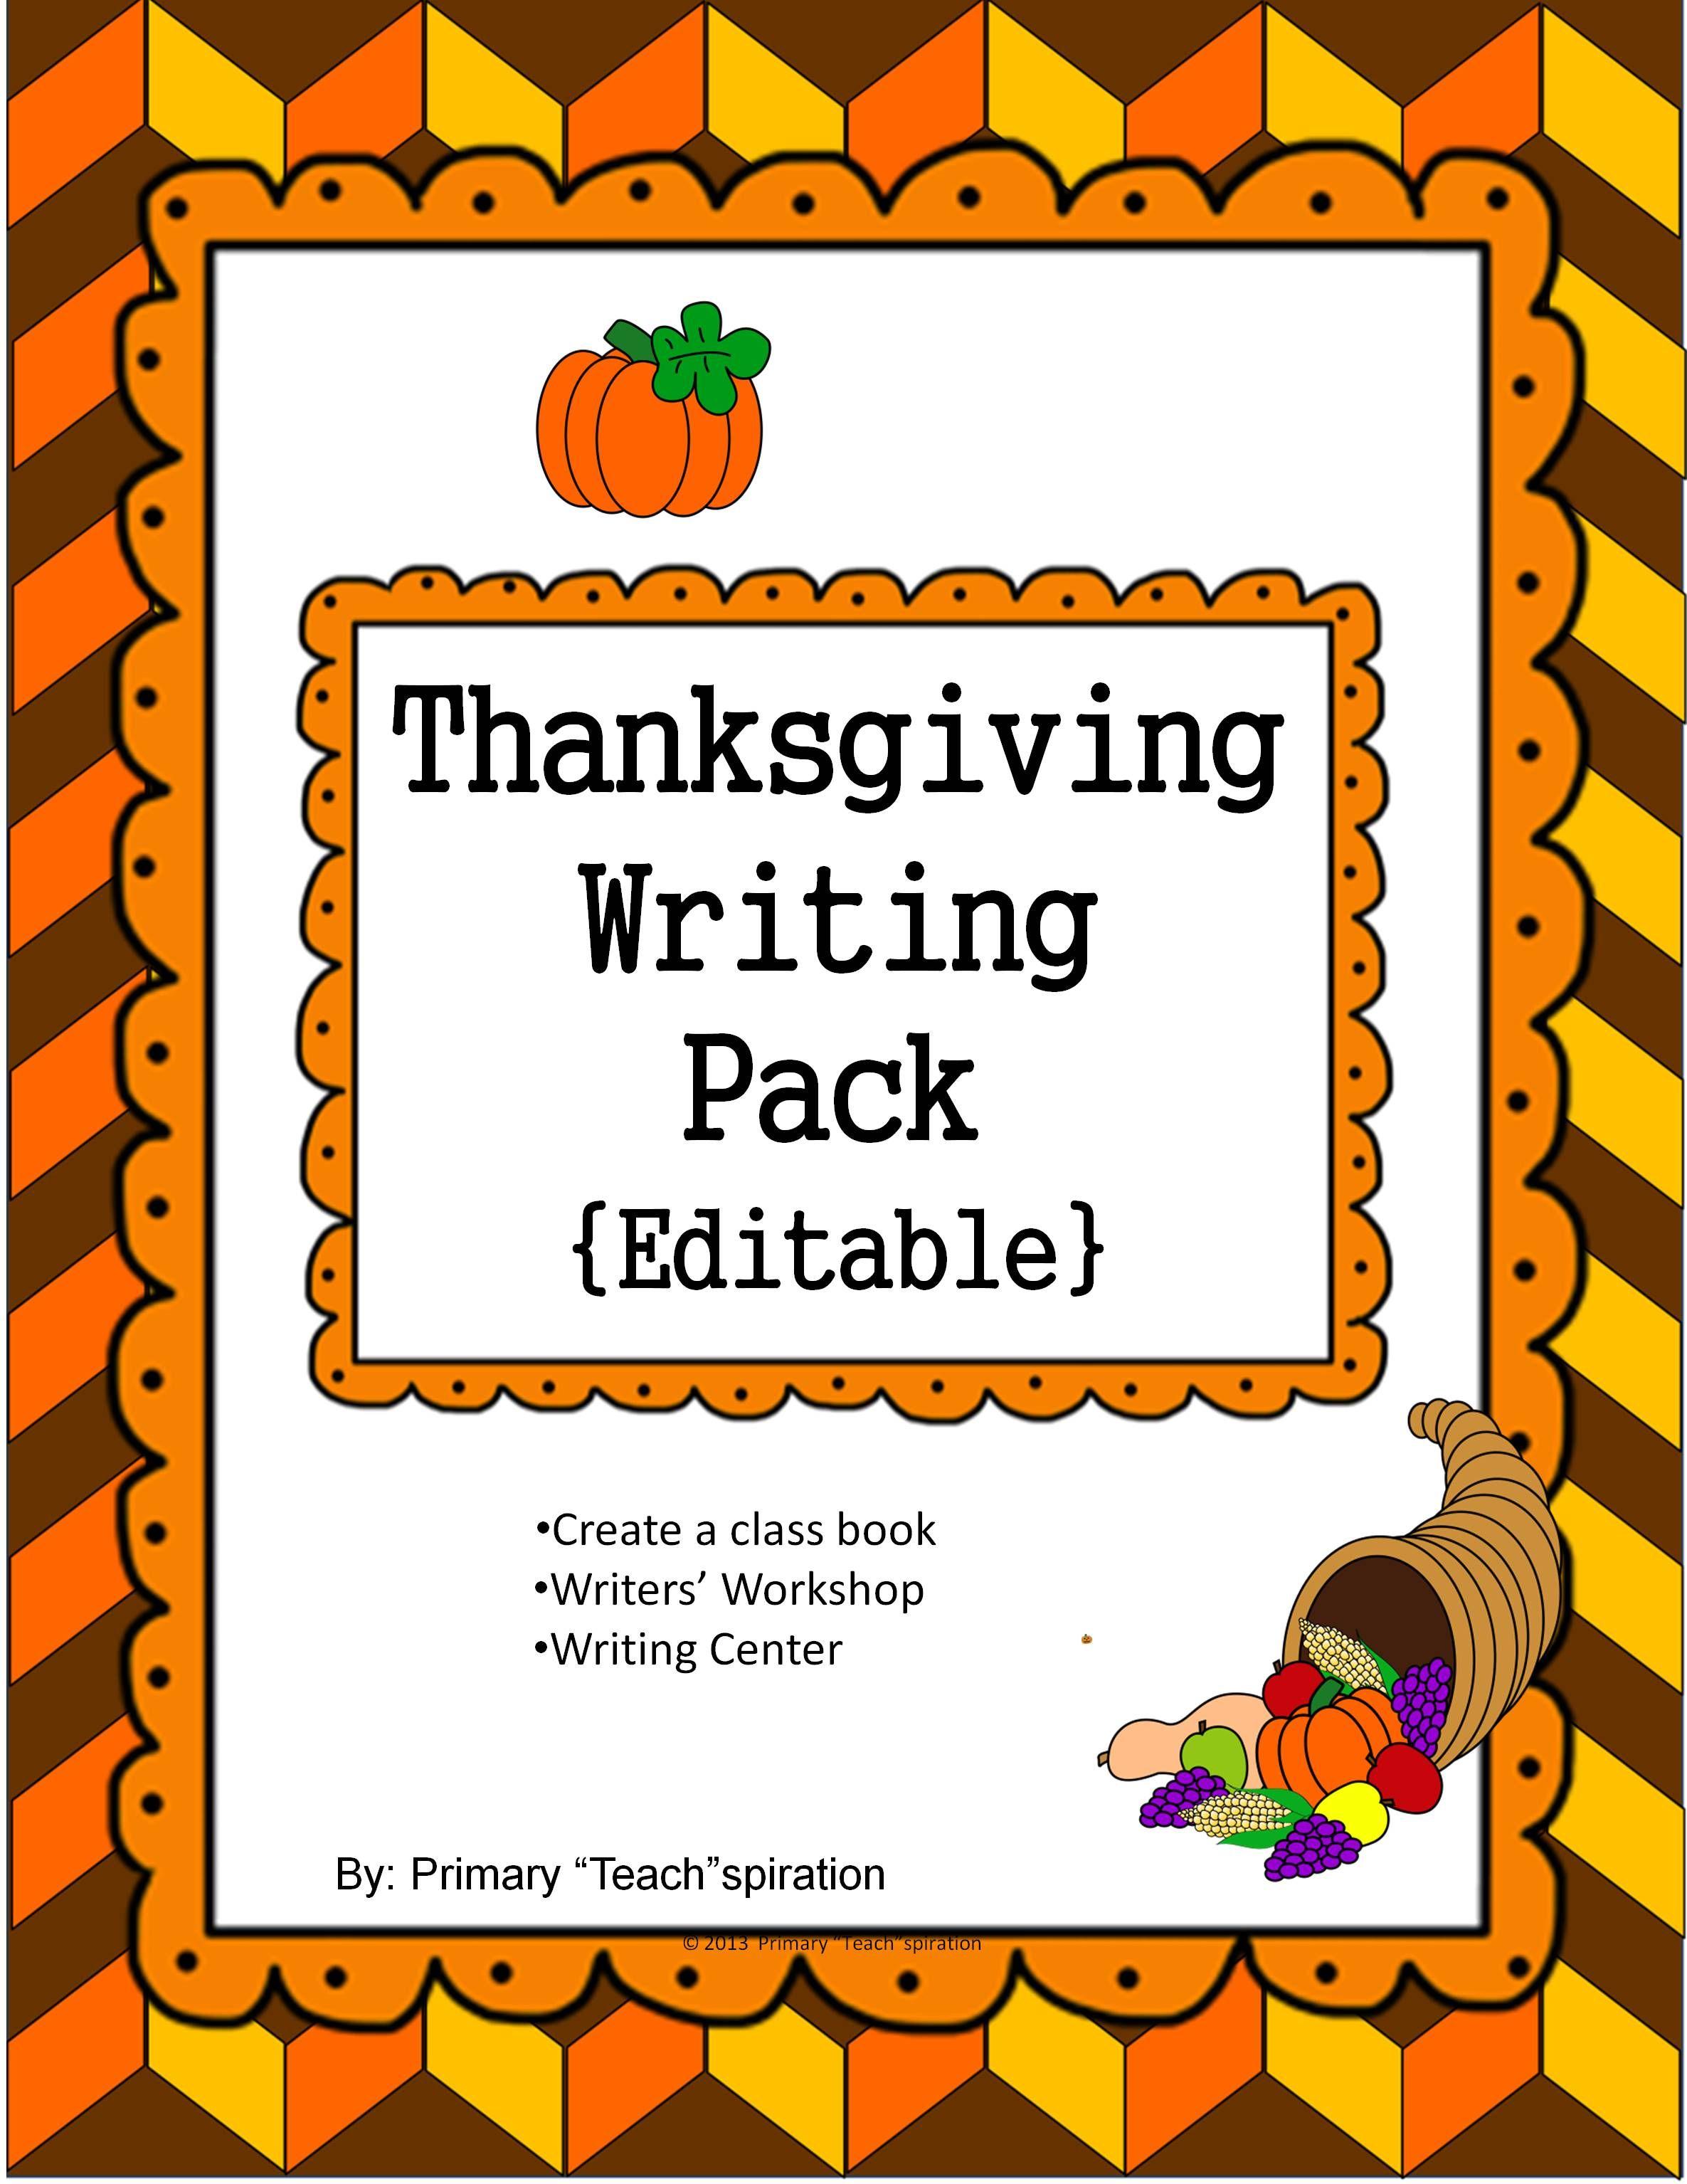 Thanksgiving Writing Pack Editable